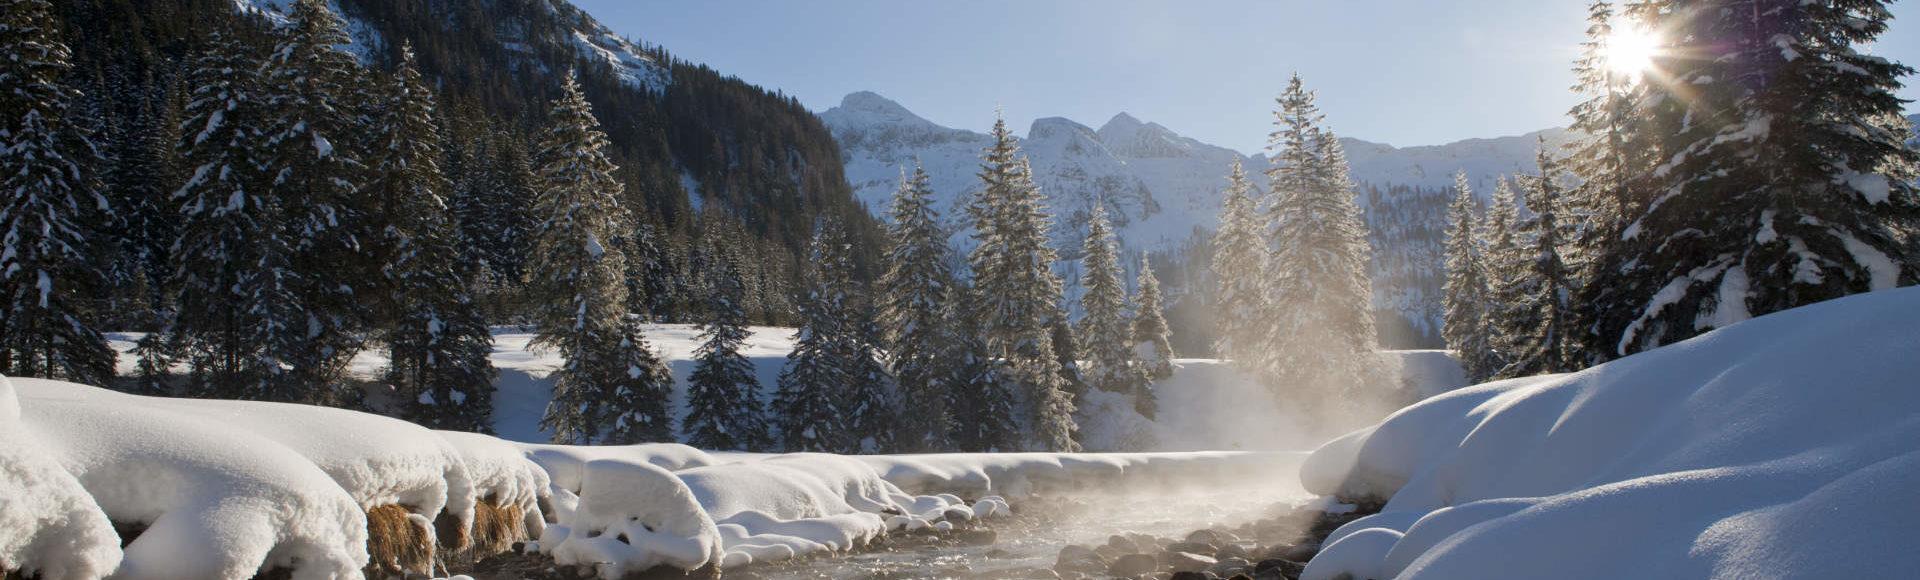 Bestpreisgarantie Beitragsbild Andis Skihotel 1